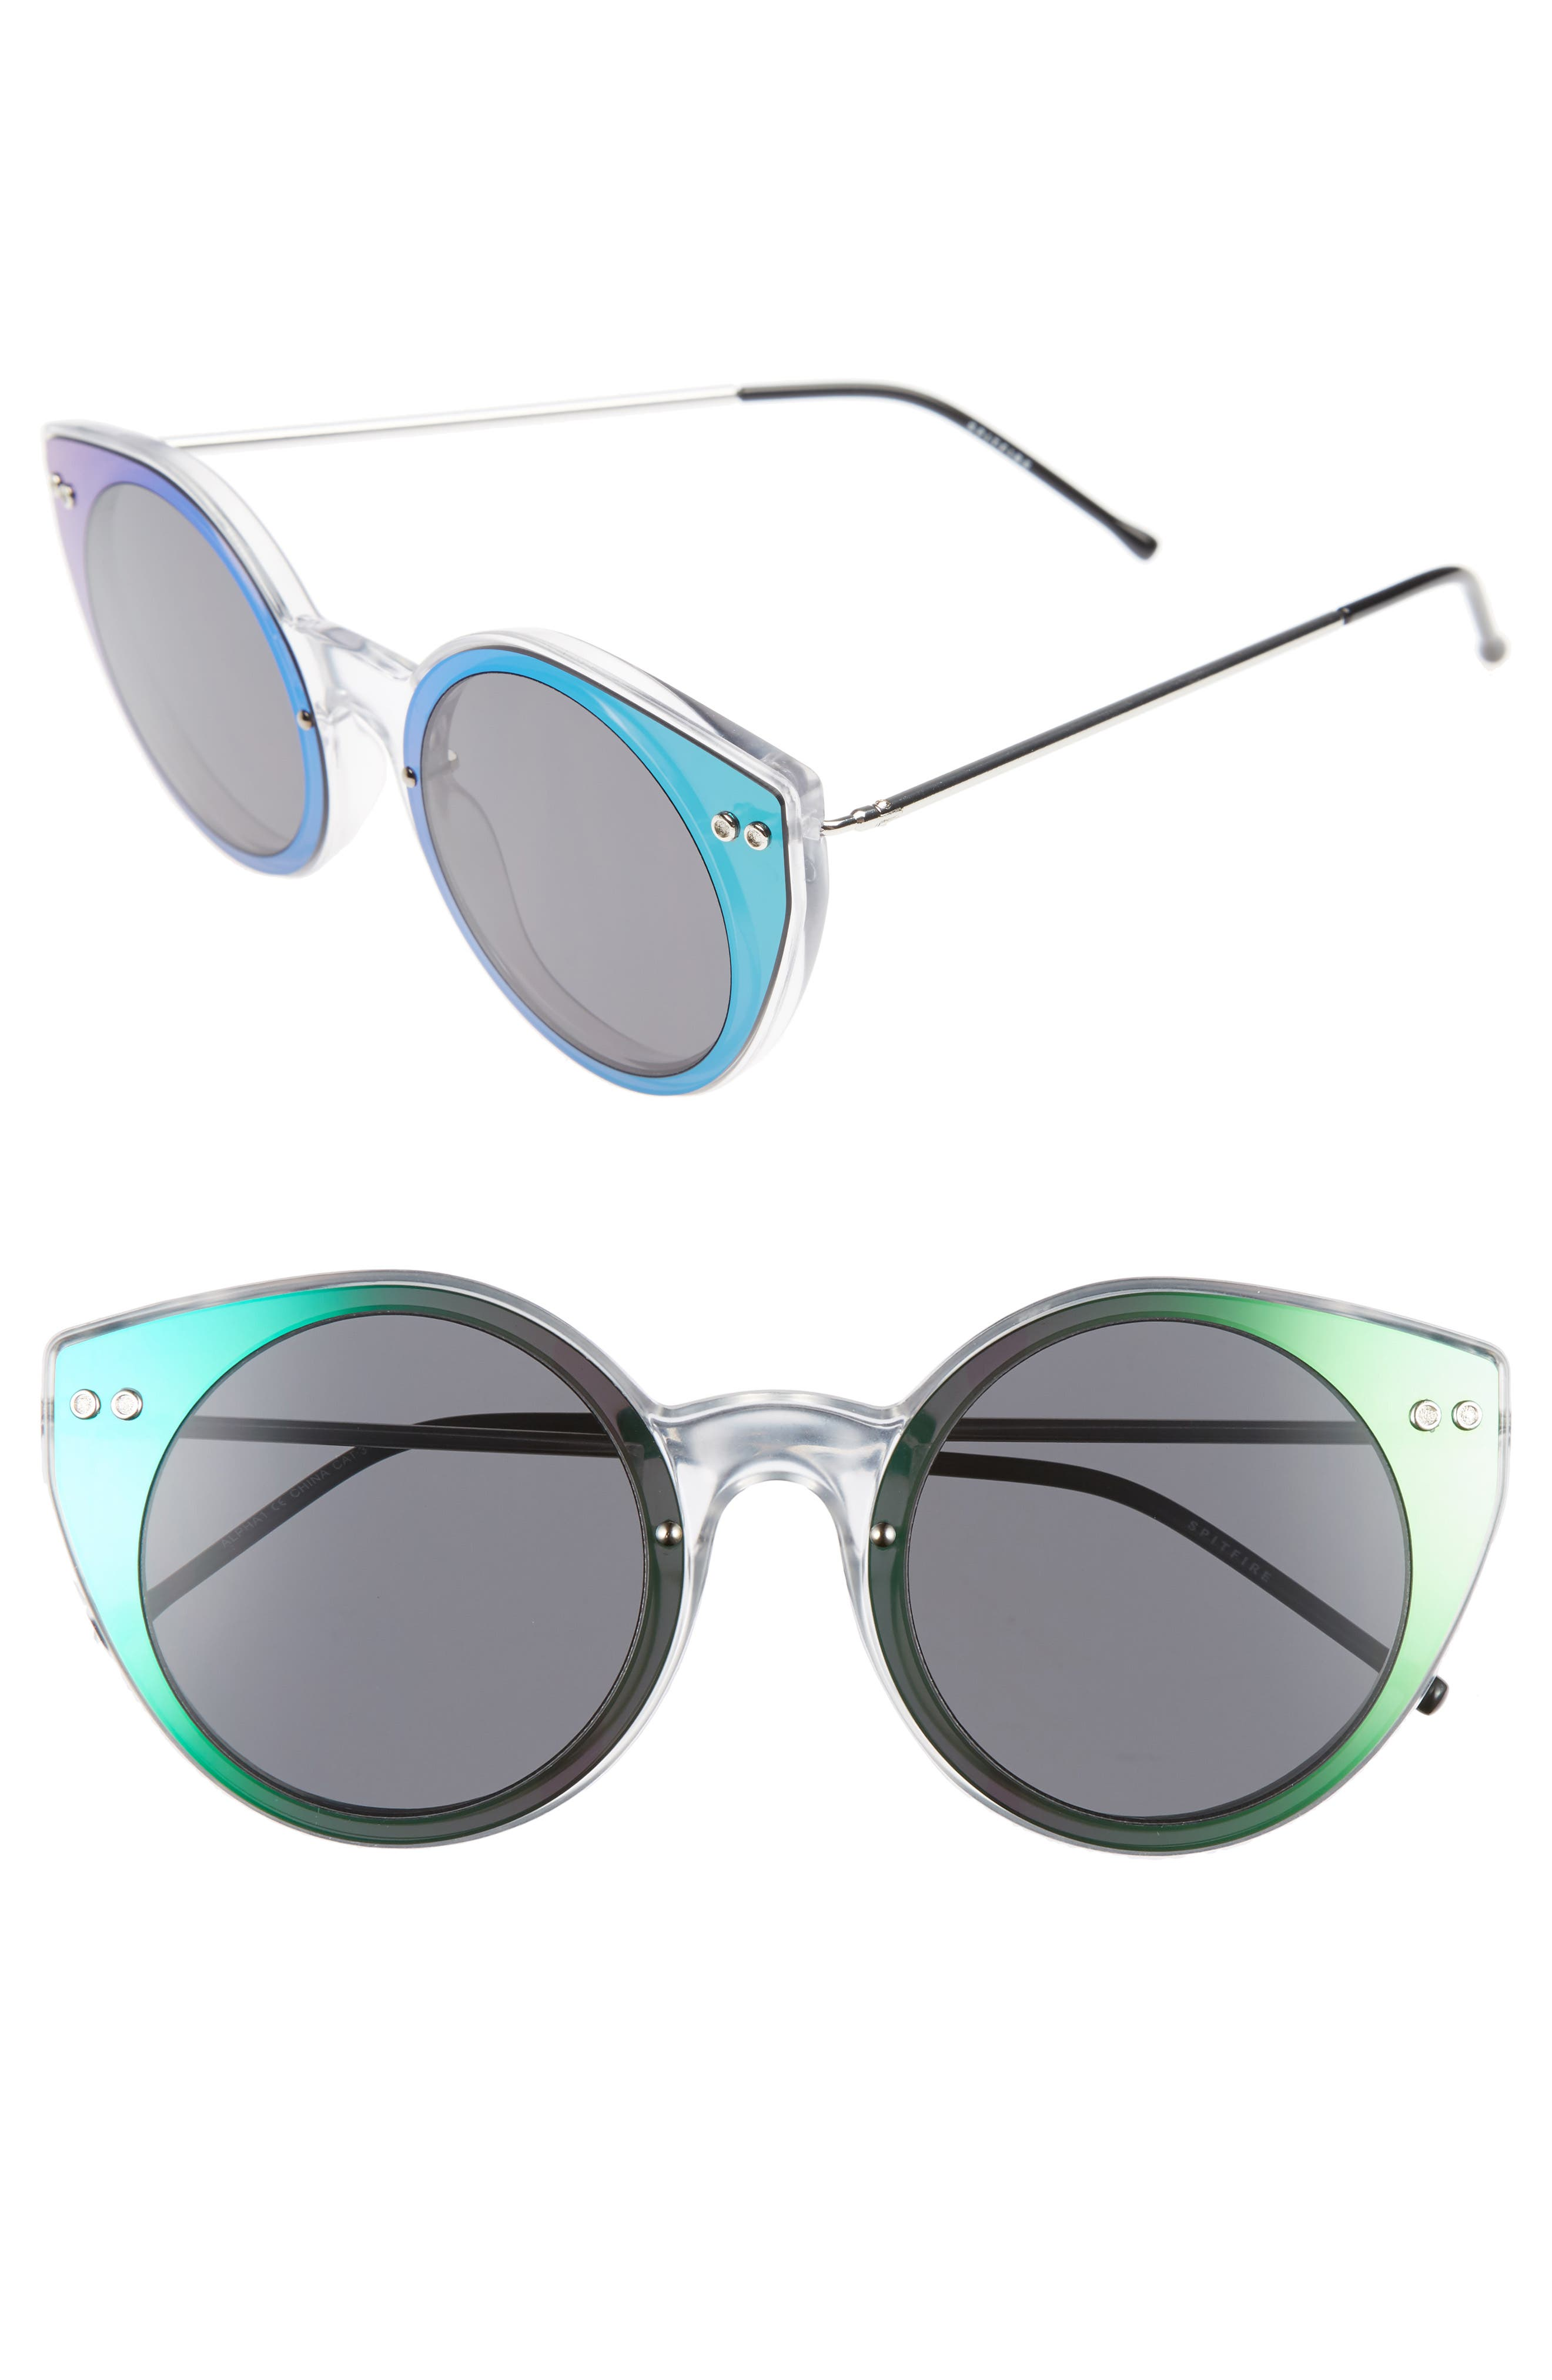 Main Image - Spitfire Alpha 1 60mm Mirrored Sunglasses